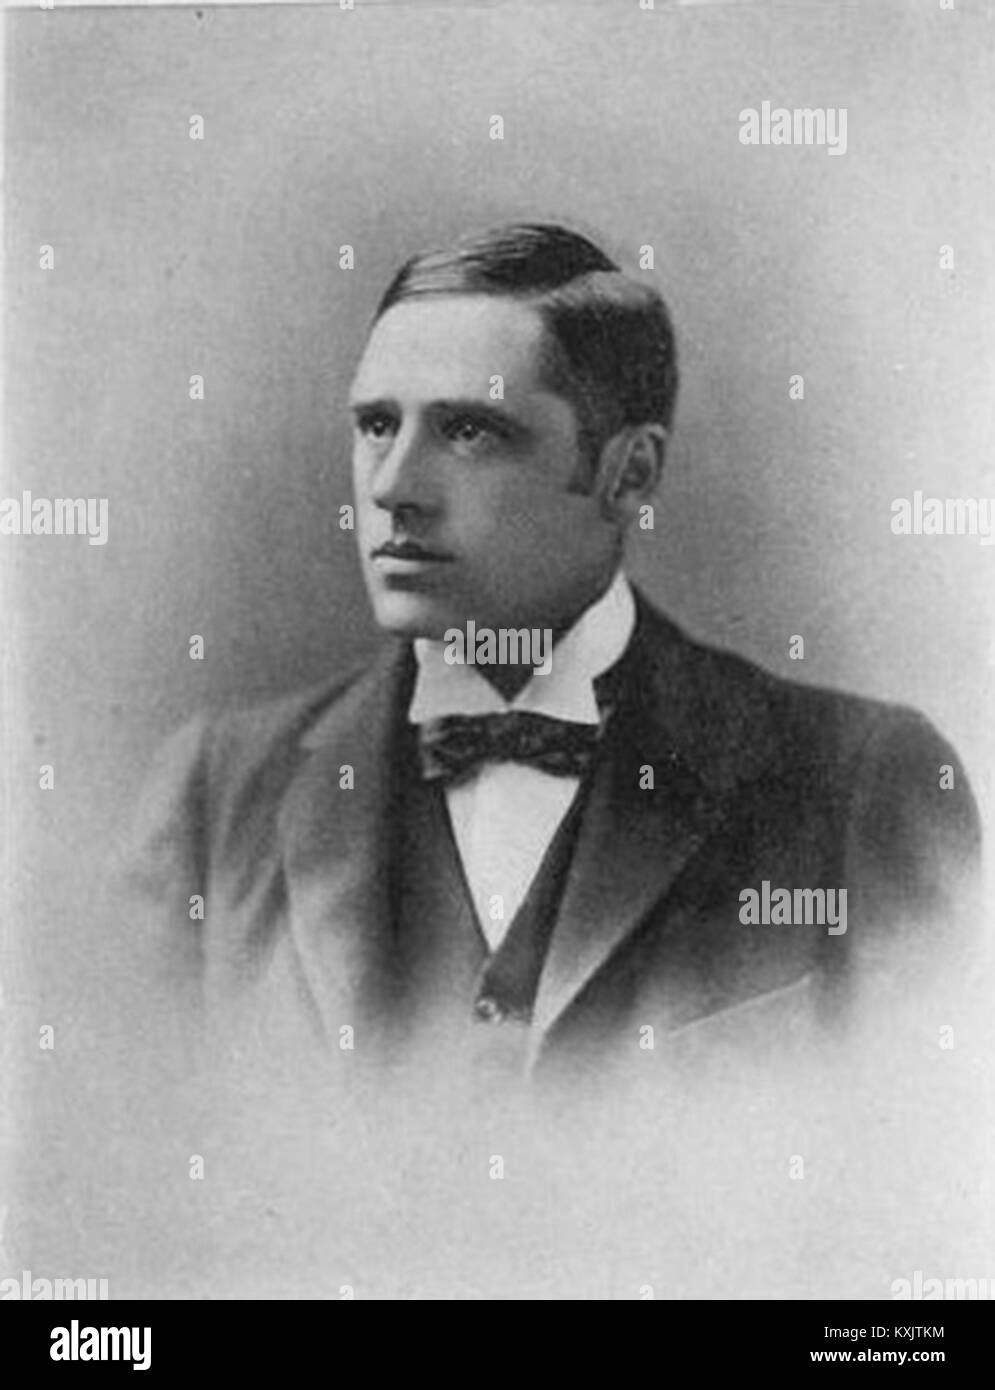 Banjo Paterson, Andrew Barton 'Banjo' Paterson, Australian poet and author, wrote 'Waltzing Matilda', - Stock Image